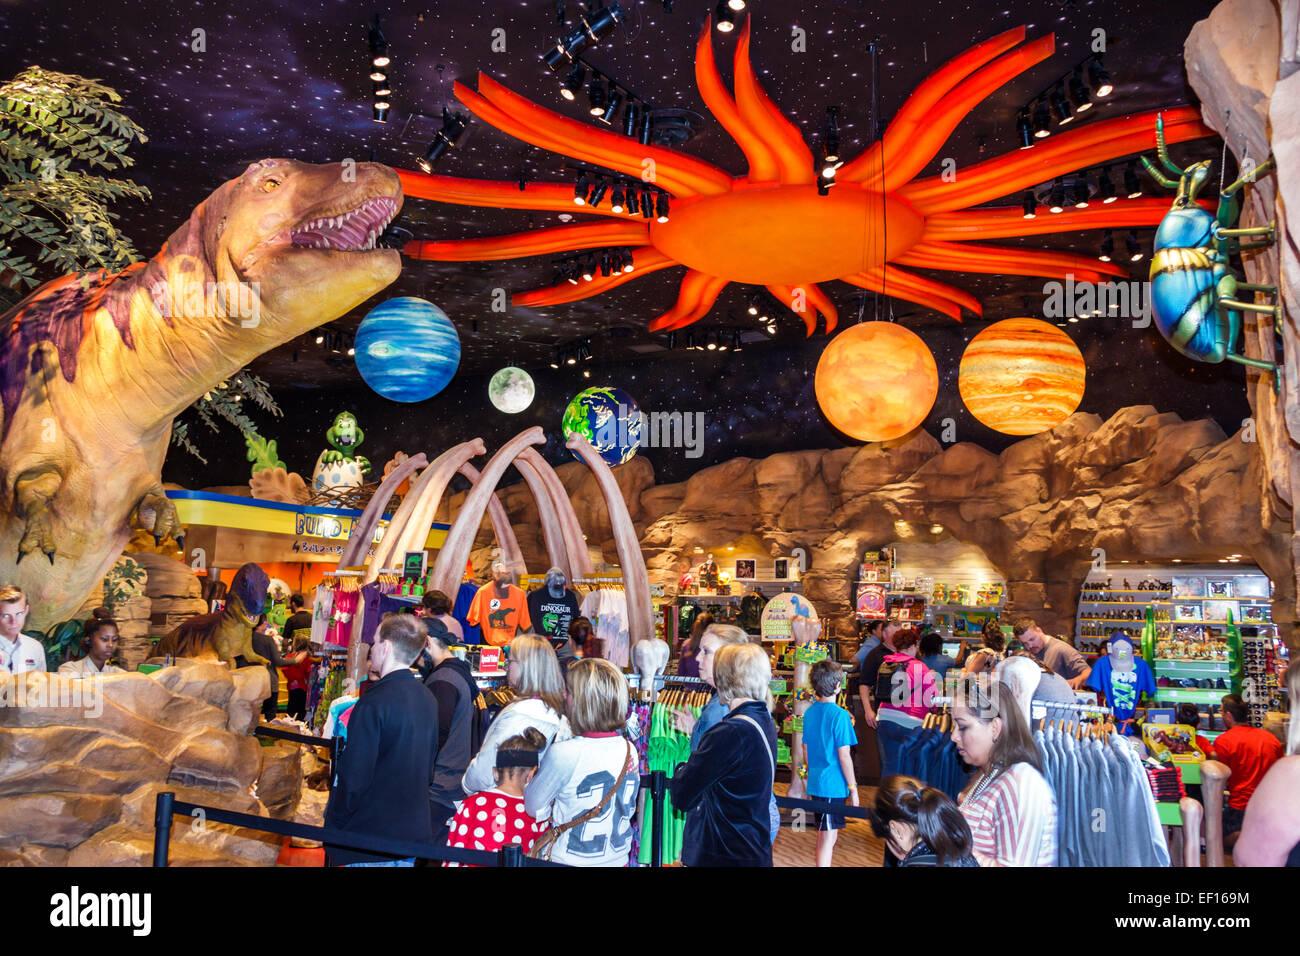 Florida, FL, Sur, Orlando, Lake buena Vista, Downtown Disney Springs, compras compradores tiendas mercados mercado Foto de stock